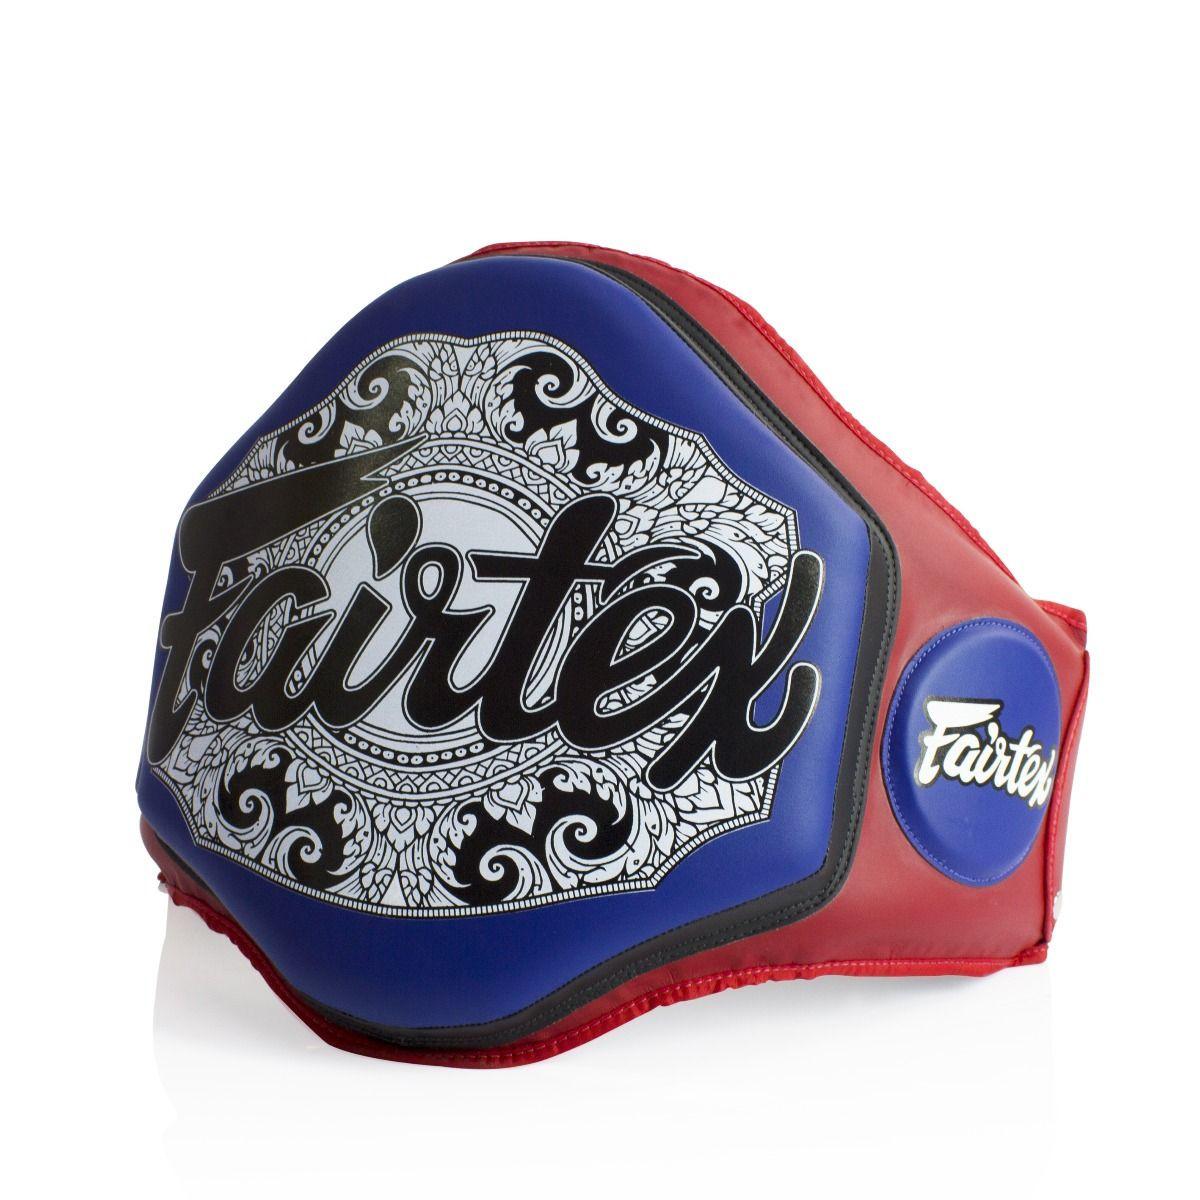 Fairtex Boxing Muay Thai Microfiber Belly Pad Red/Blue